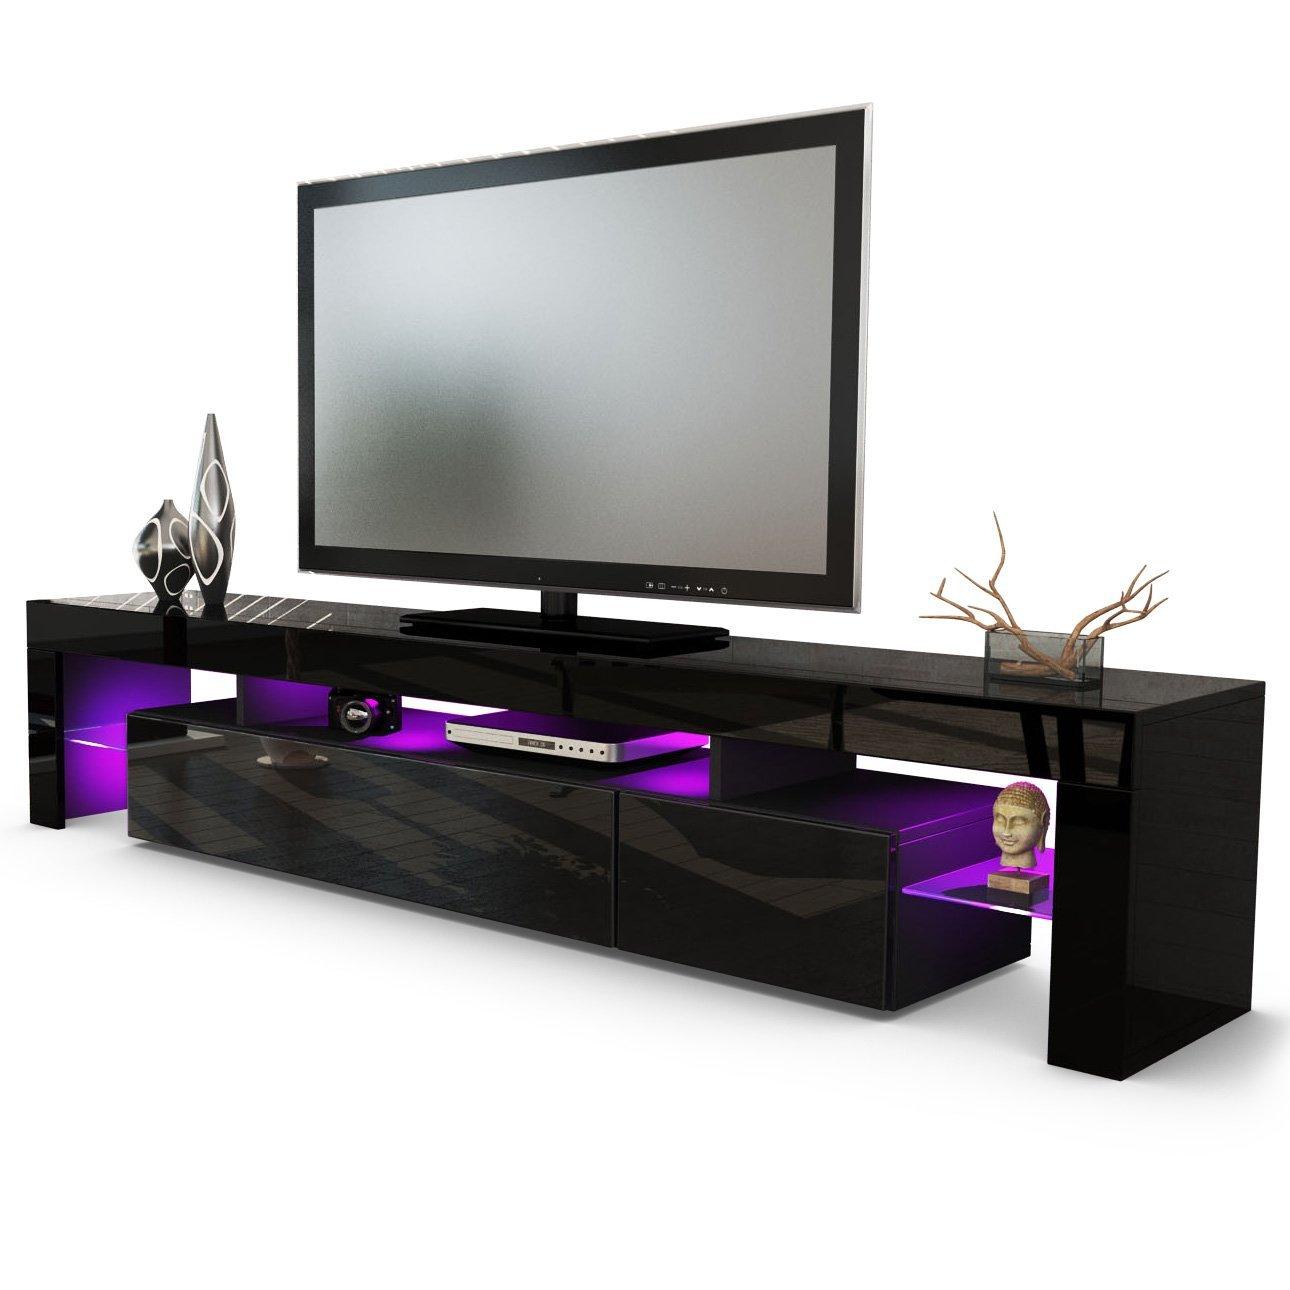 eck tv schrank wei top lowboard in grau wei design with eck tv schrank wei gotland tvschrank. Black Bedroom Furniture Sets. Home Design Ideas